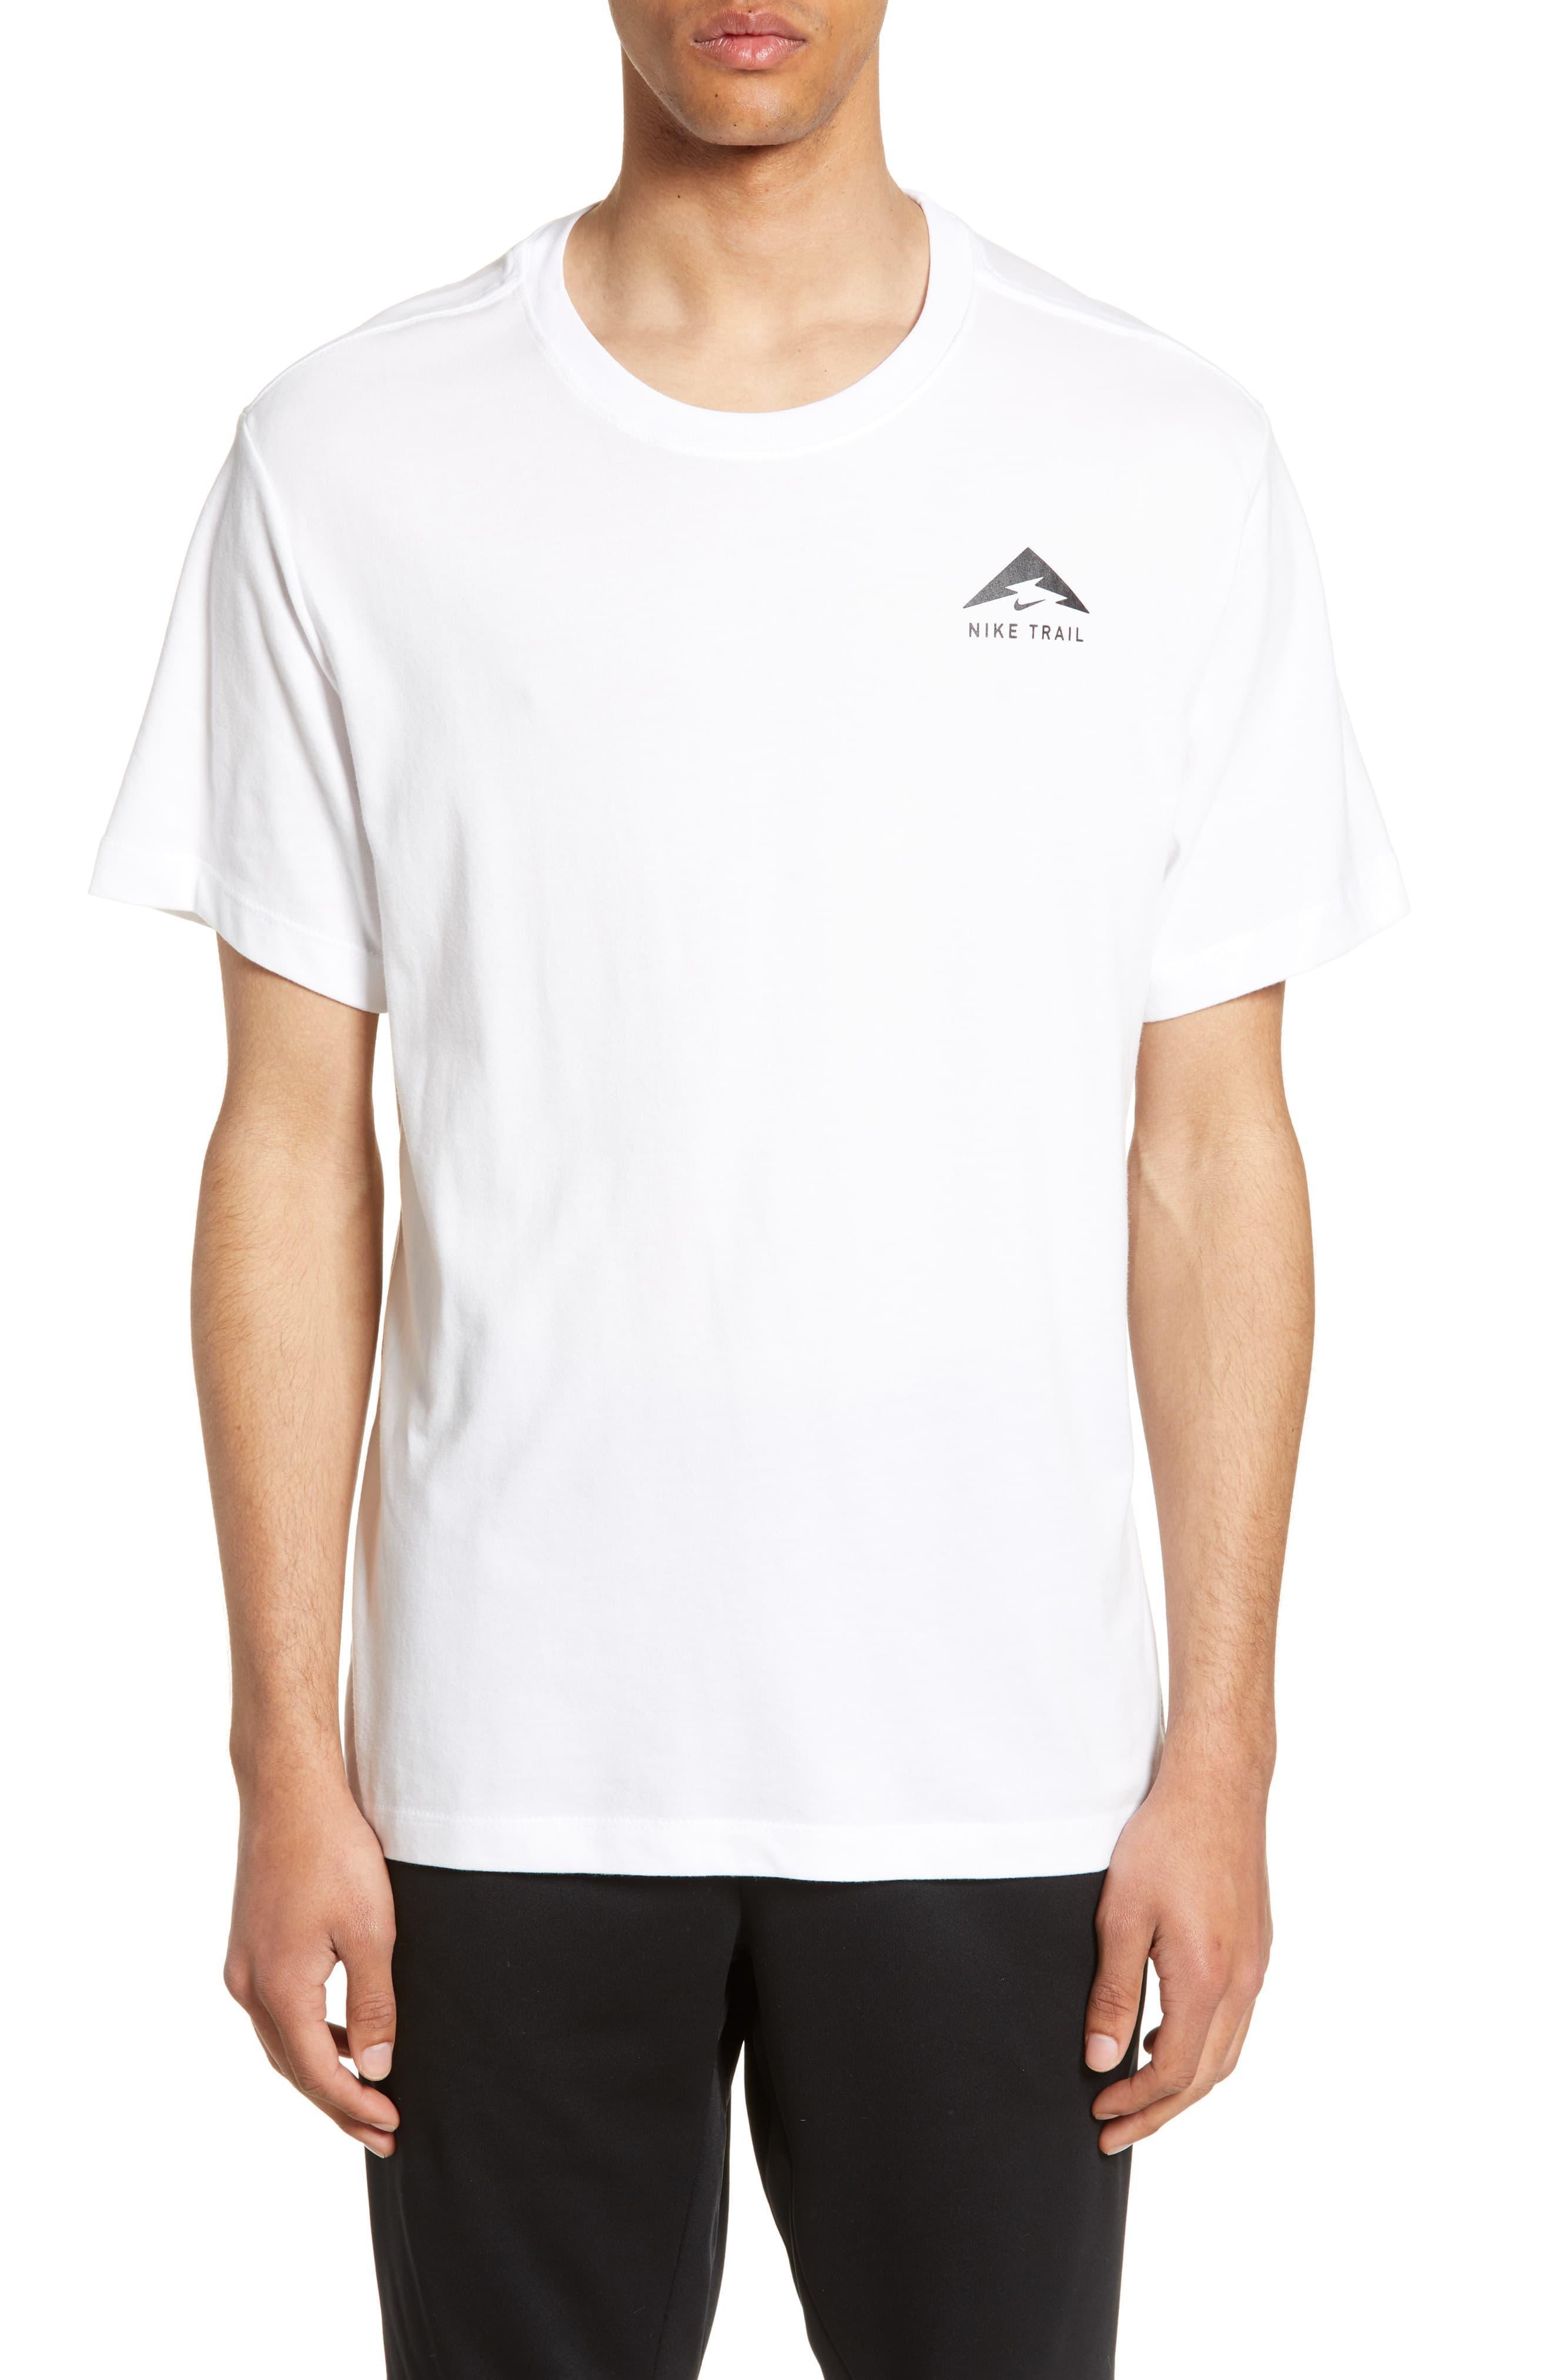 tee shirt nike trail